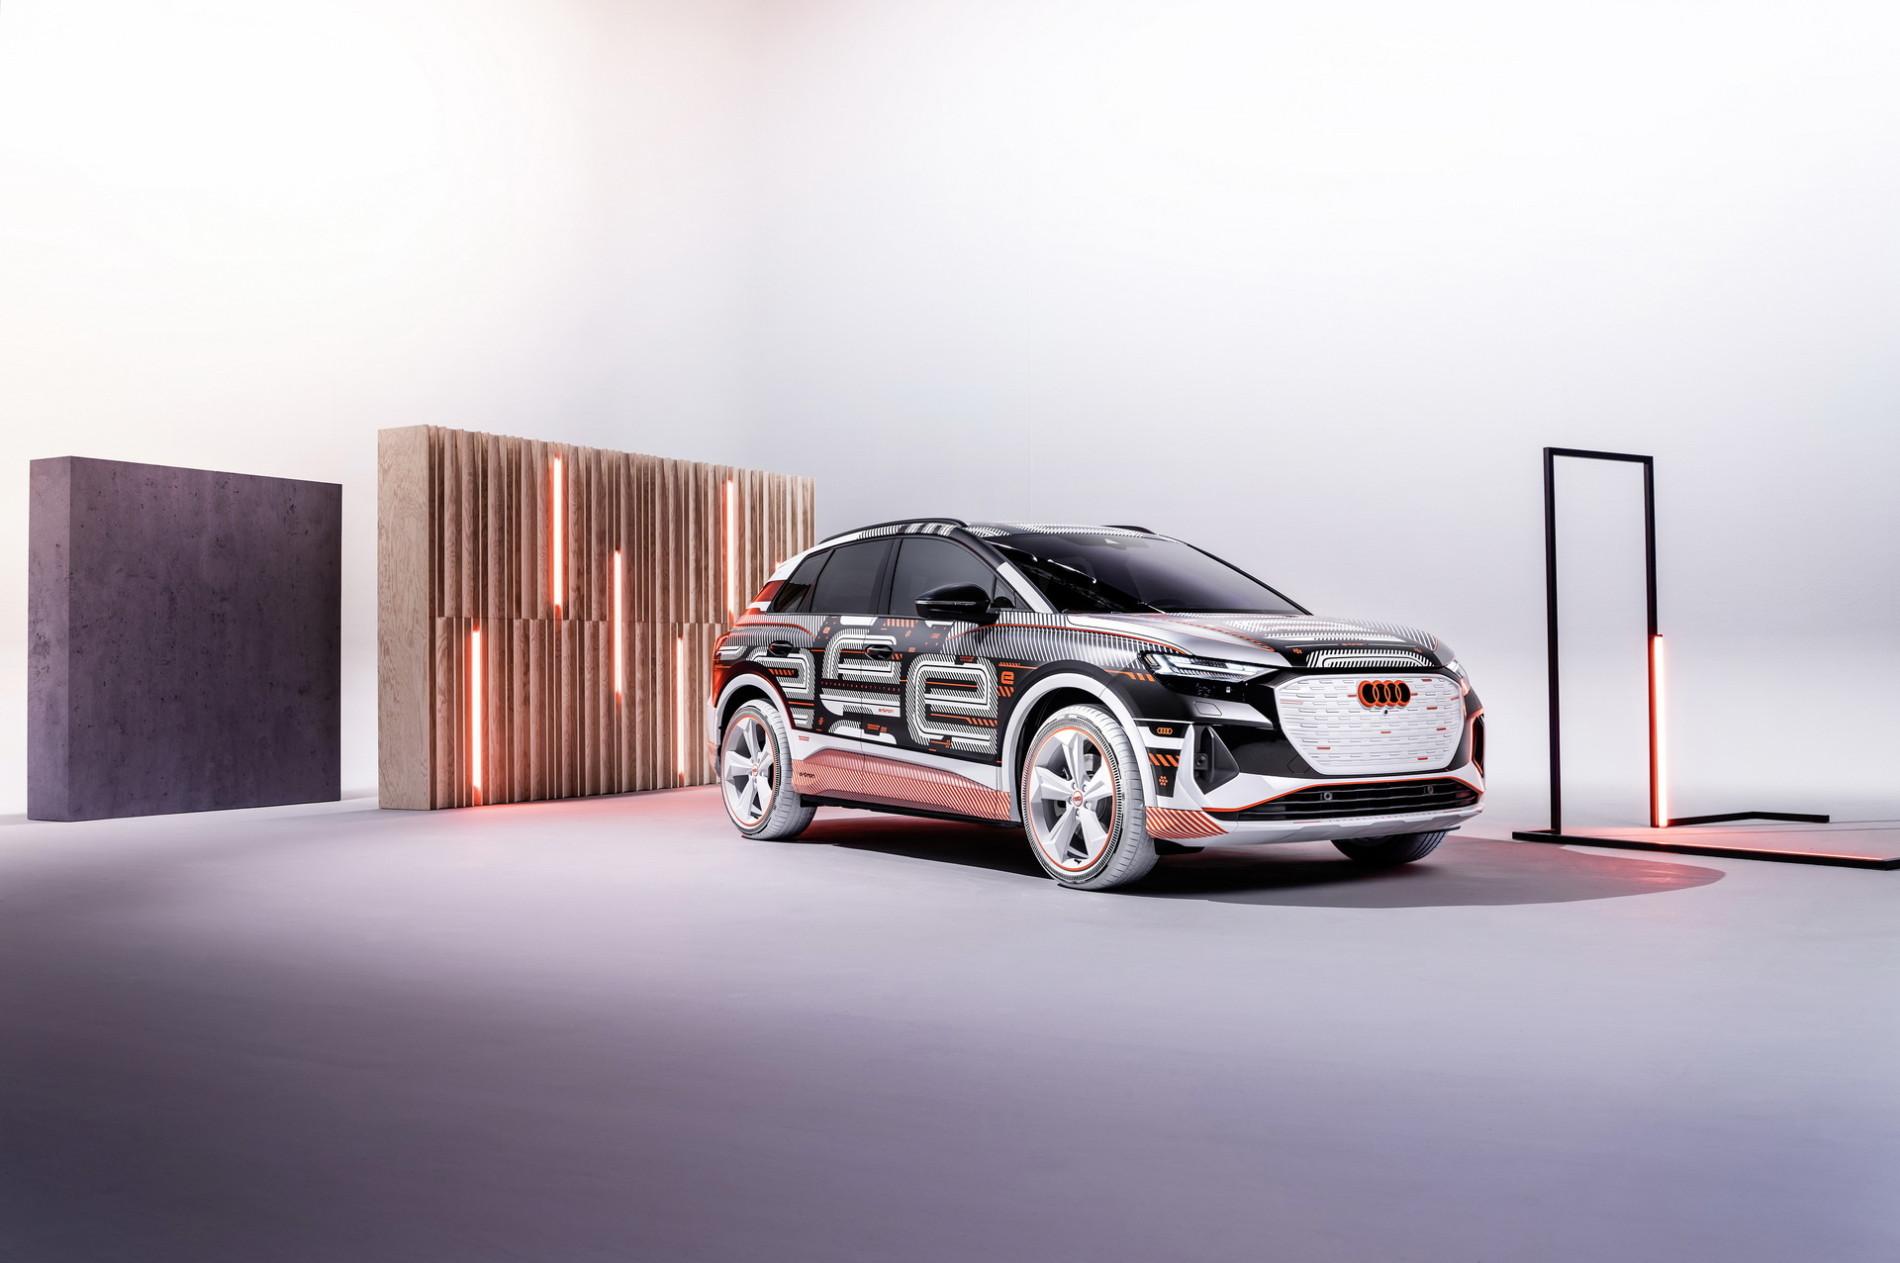 Audi Q4 E-Tron - Audi Q4 E-Tron